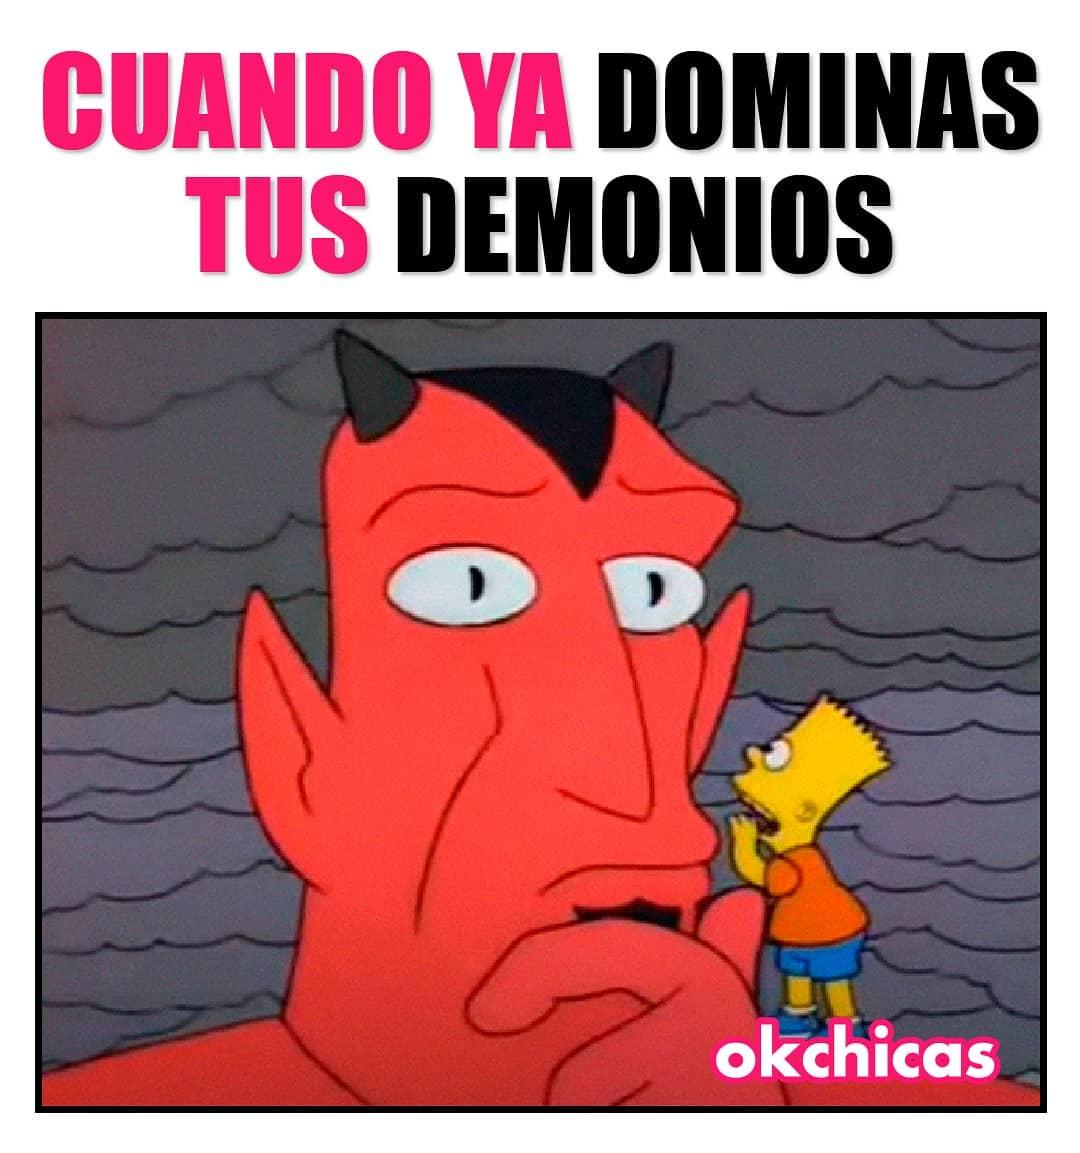 Cuando ya dominas tus demonios.